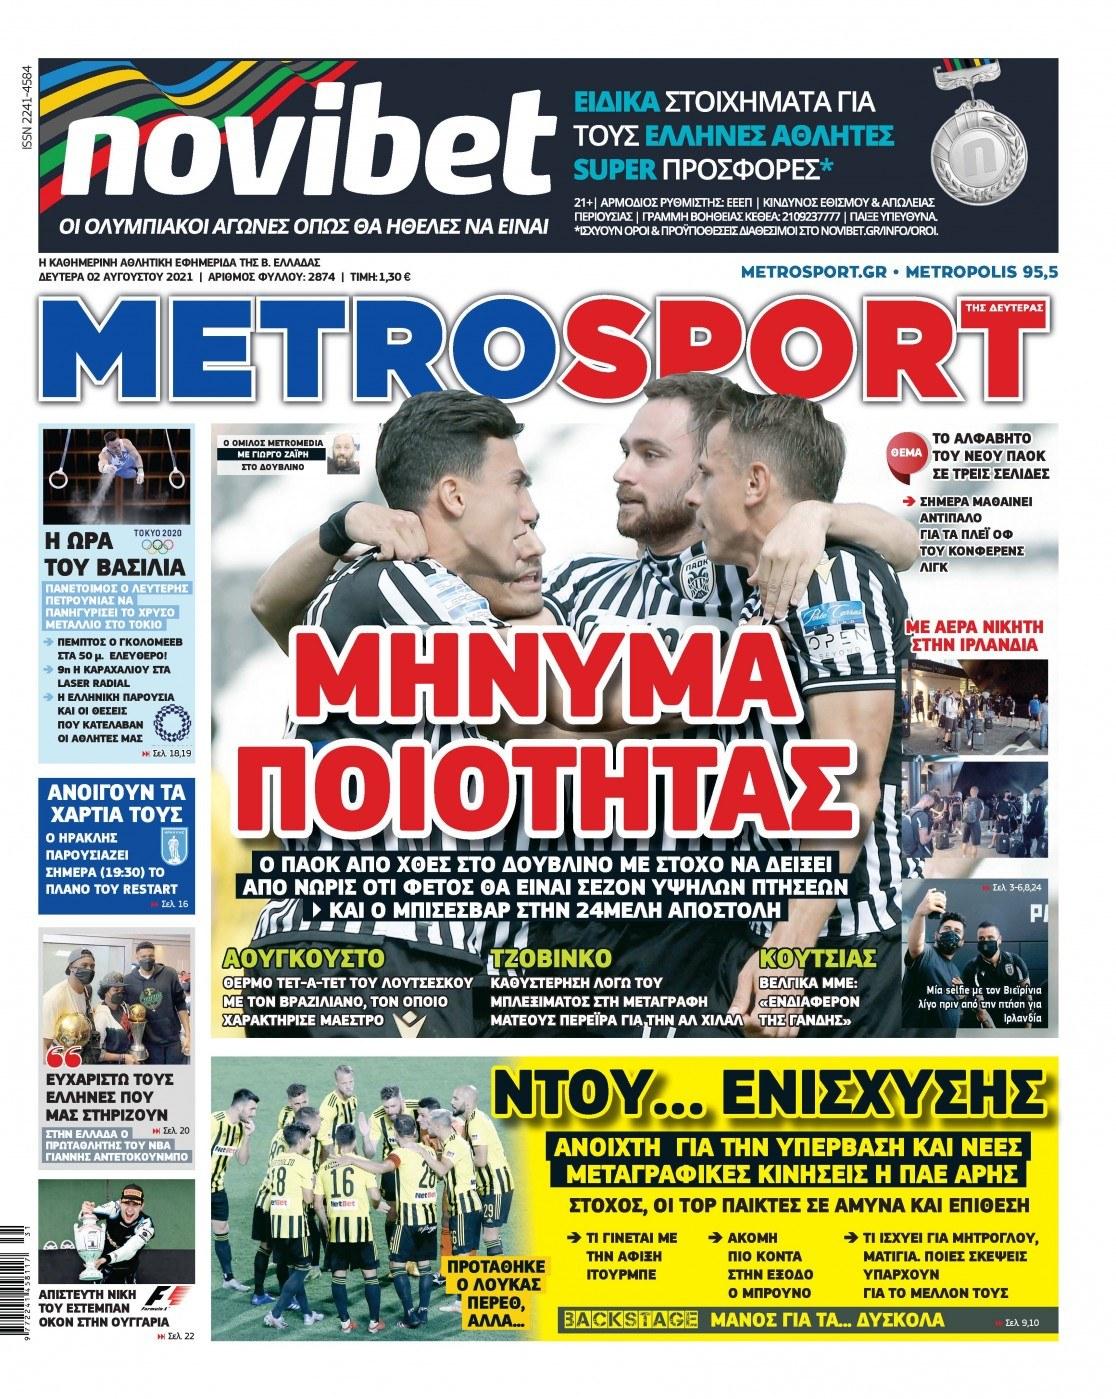 Metrosport 2.8